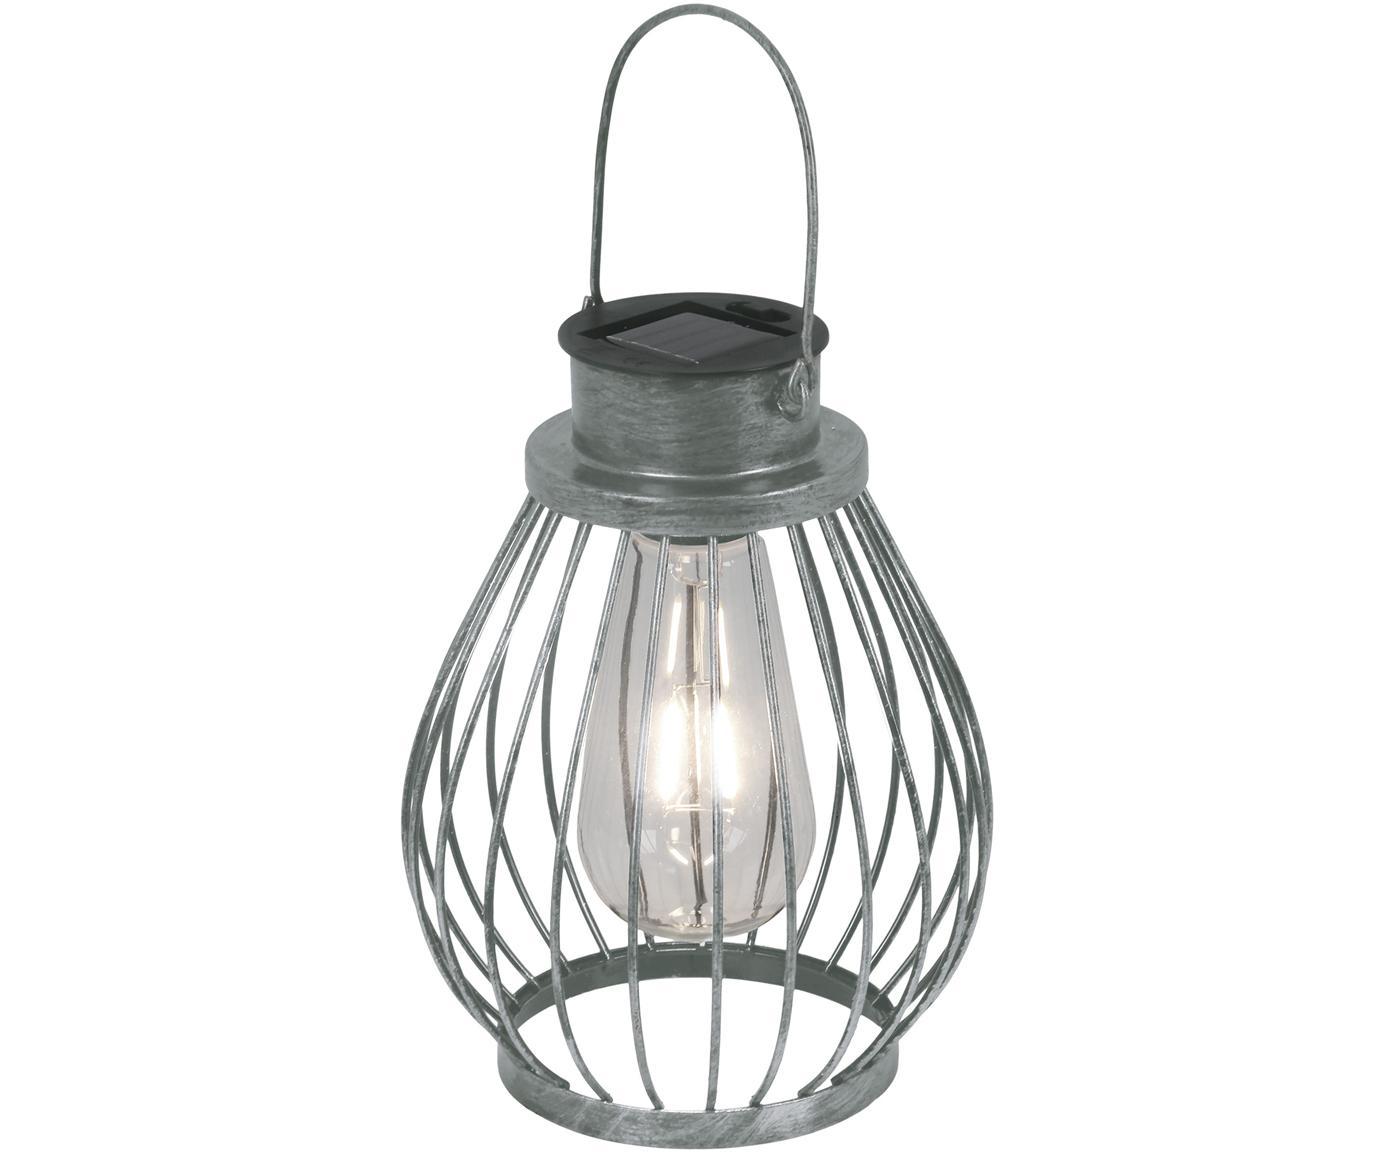 Lampada solare a LED Grid, Metallo, vetro, materiale sintetico, Acciaio inossidabile, Ø 16 x Alt. 30 cm